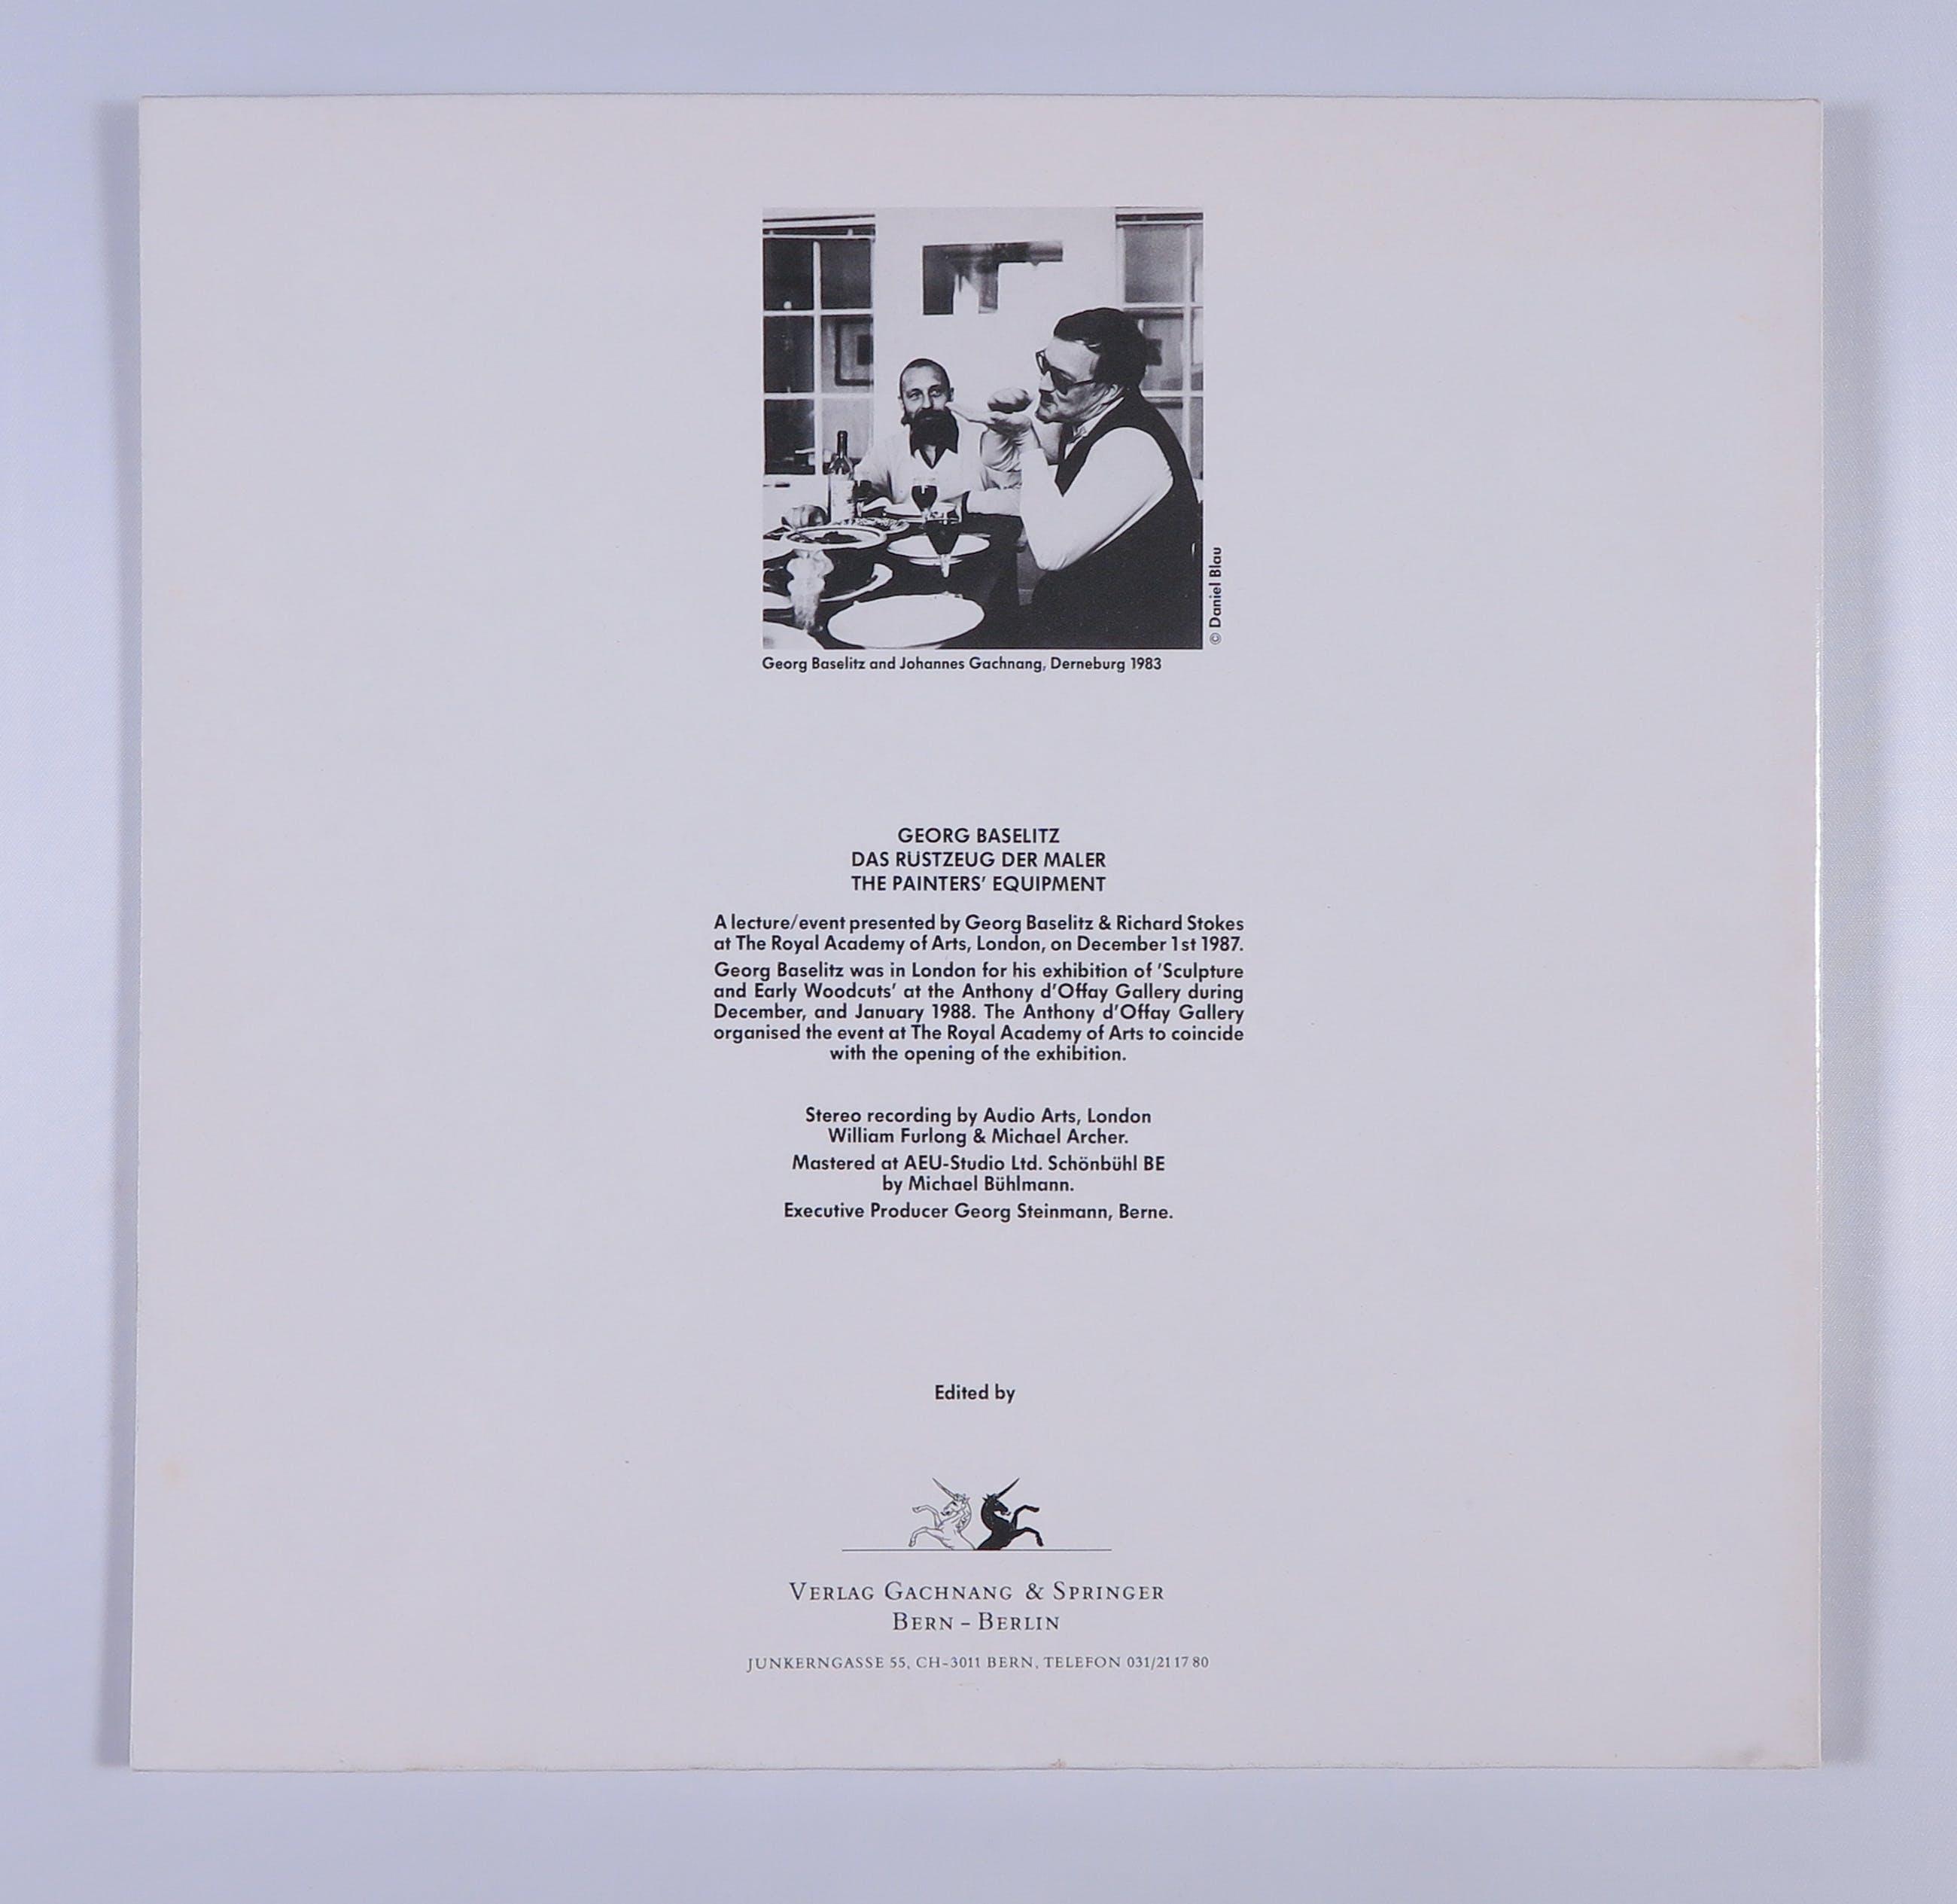 Georg Baselitz - Das Rüstzeug Der Maler / The Painters' Equipment kopen? Bied vanaf 45!